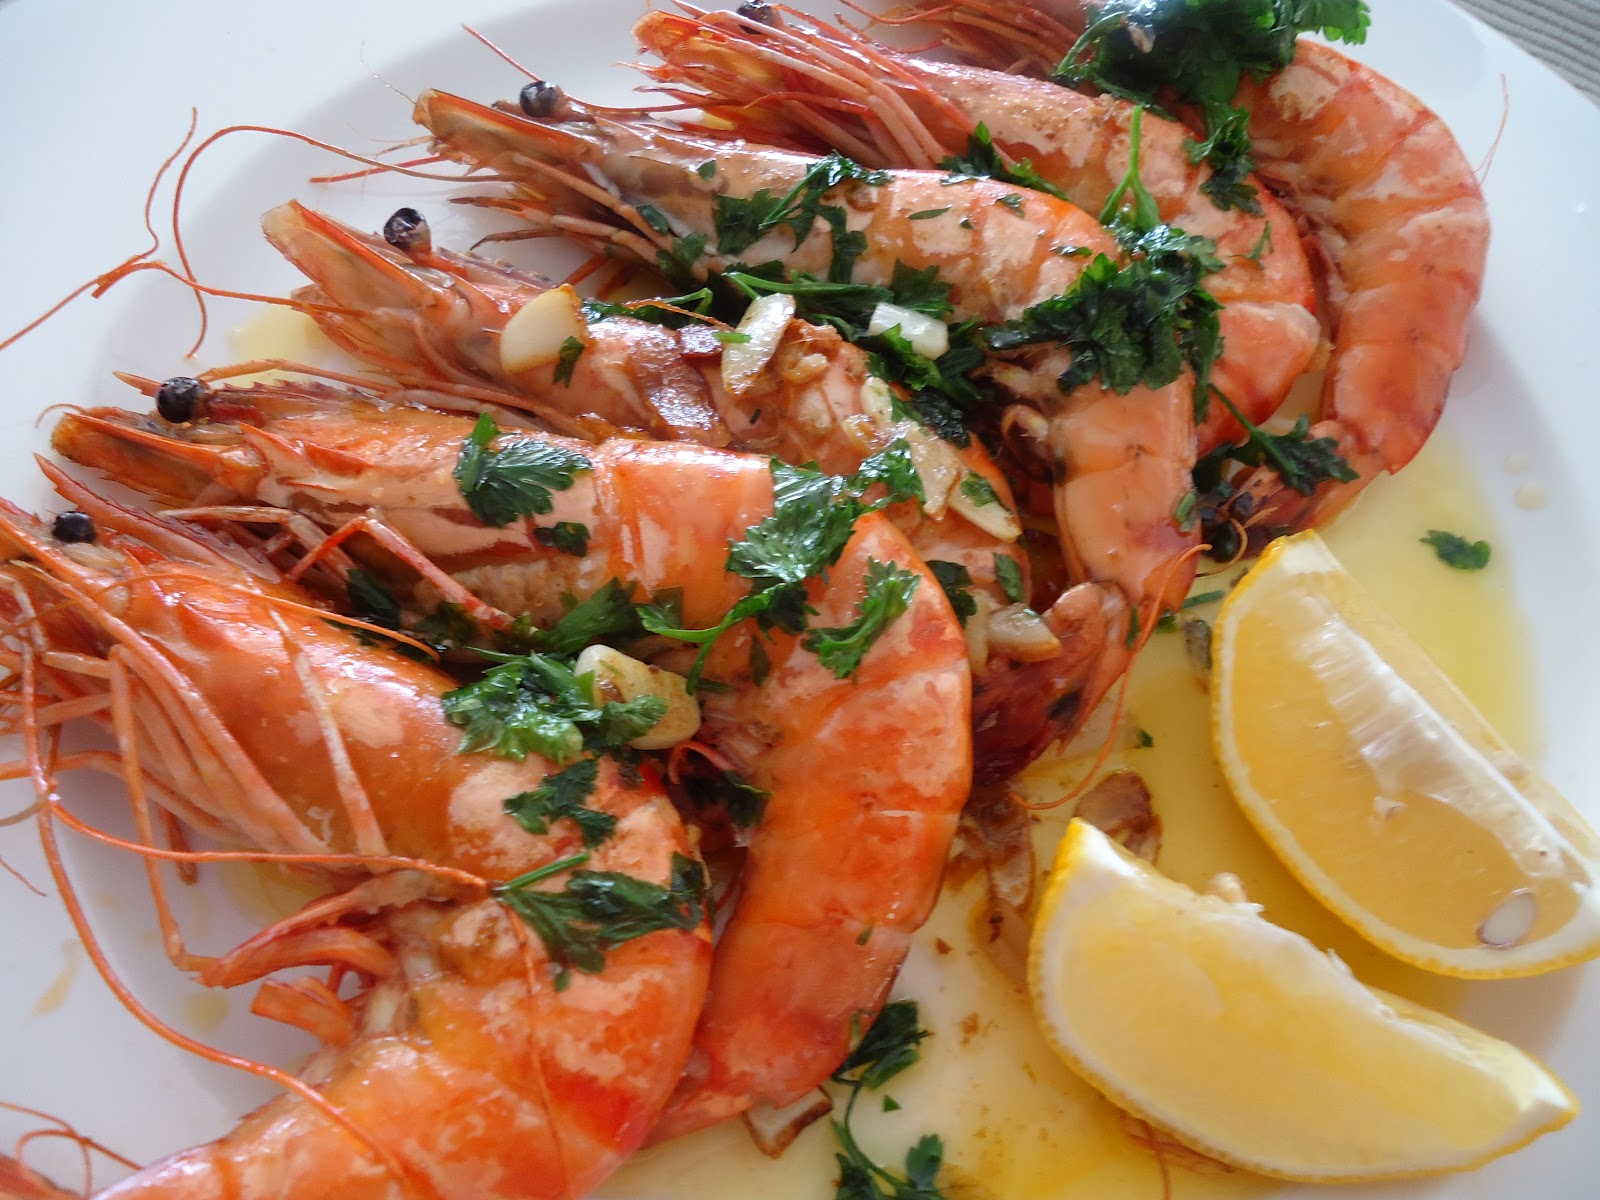 Simple food looking good gambas a la plancha for Cuisine 0 la plancha